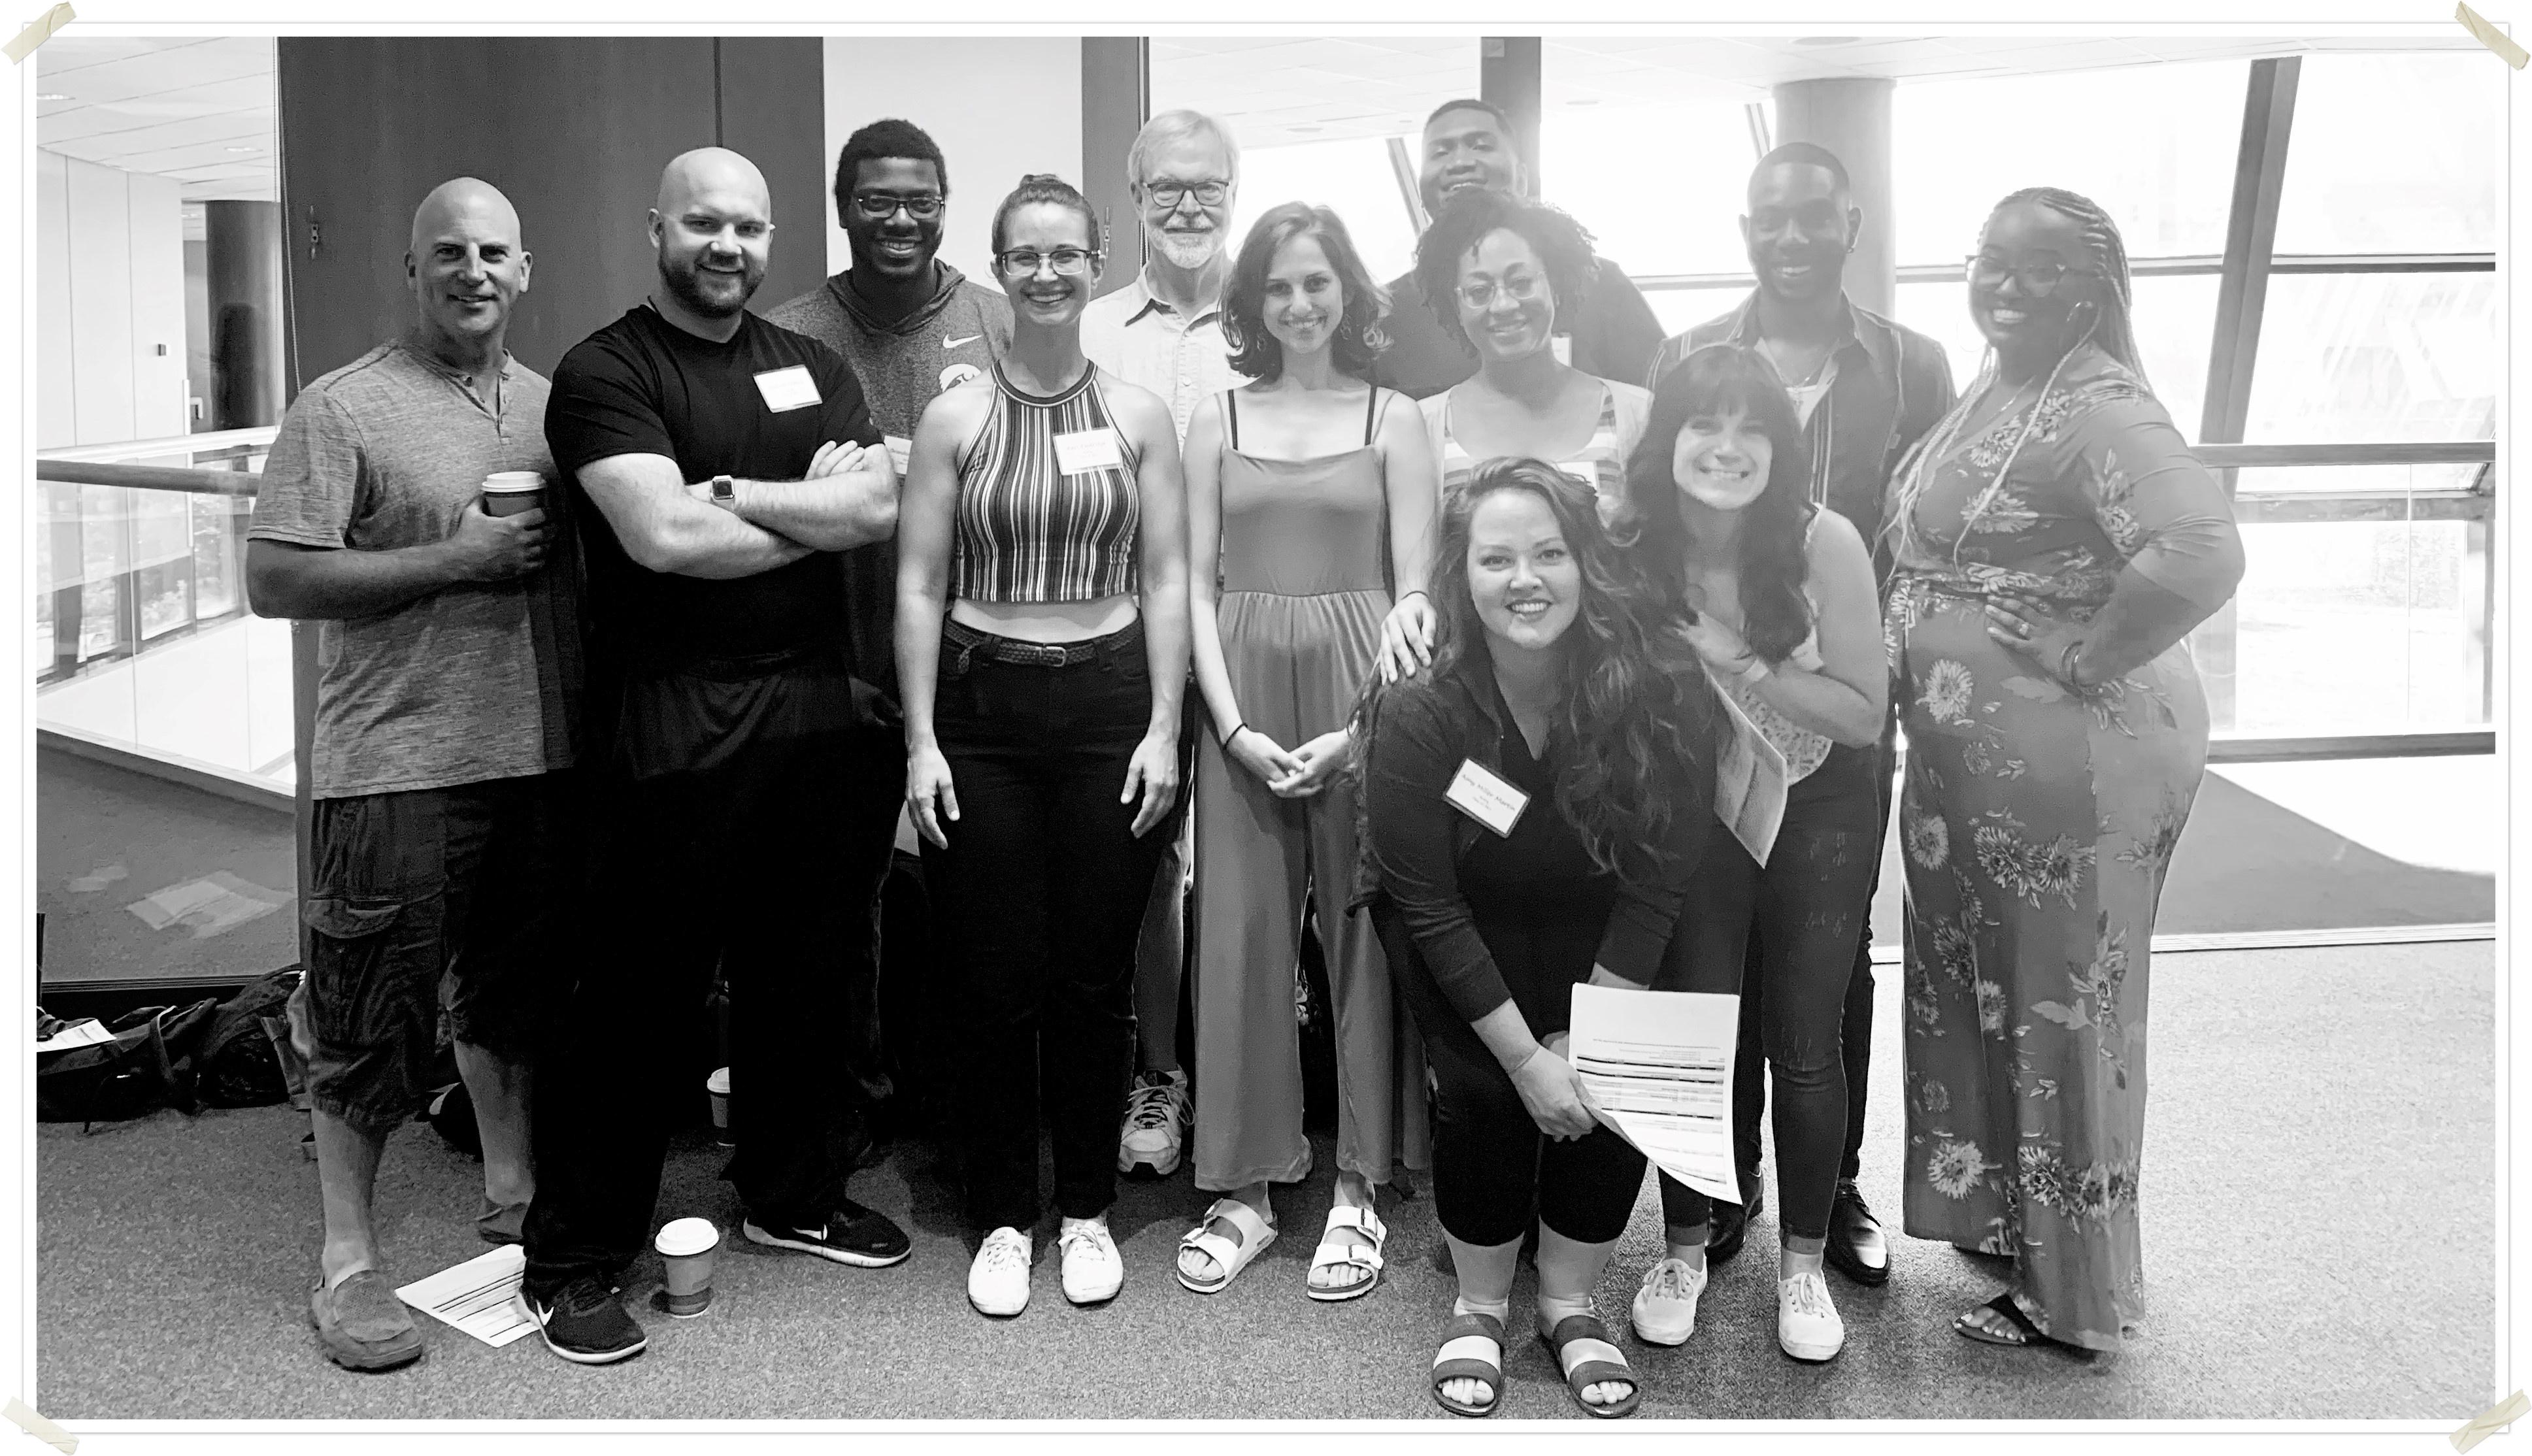 Amy Miller Photography gradfaces 2019 - theatre arts - uiowa wiki